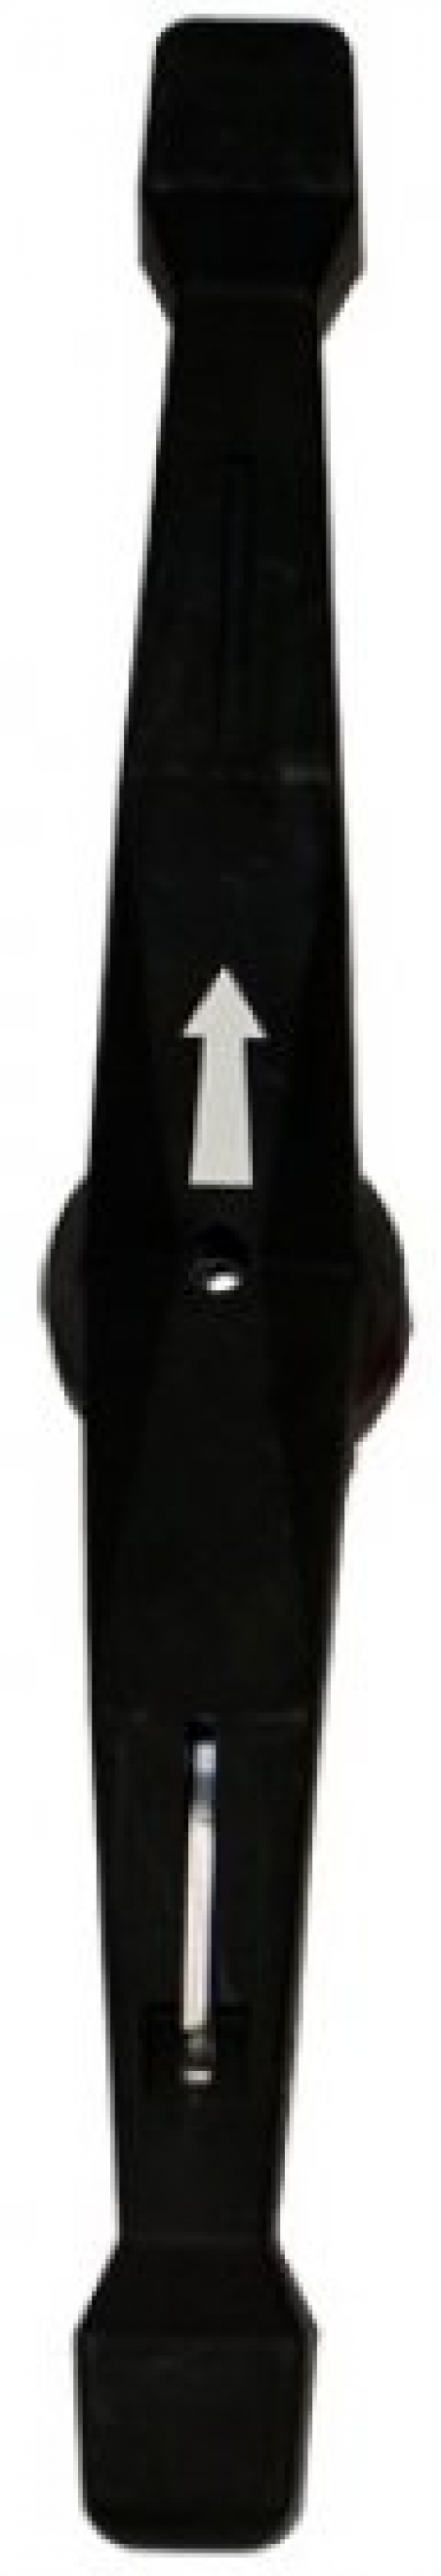 Рукоятка на корпус LBS-DH 3200/B (CO) (черн., для LBS 800-3200А...CO 2000-3200A)